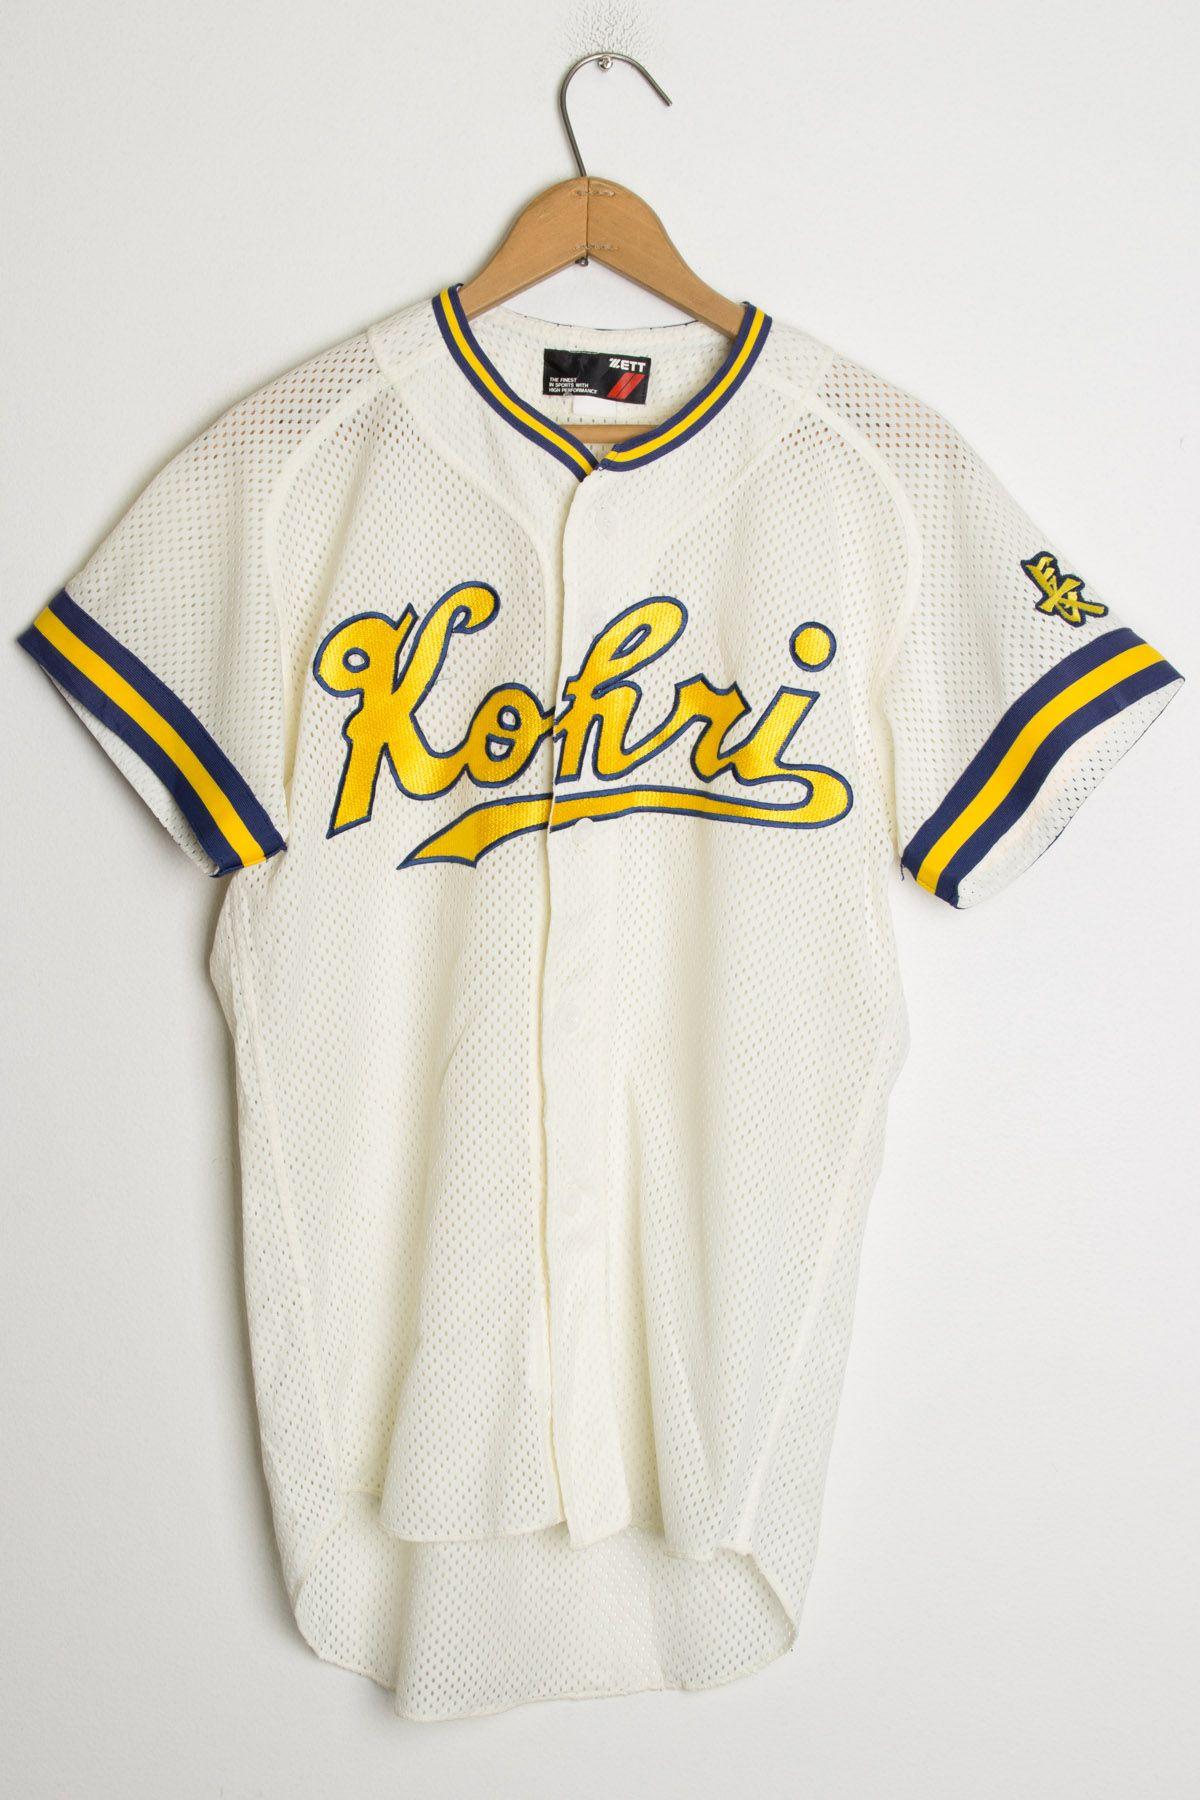 1f29e4fdcbf6 Japanese Baseball Jersey 122